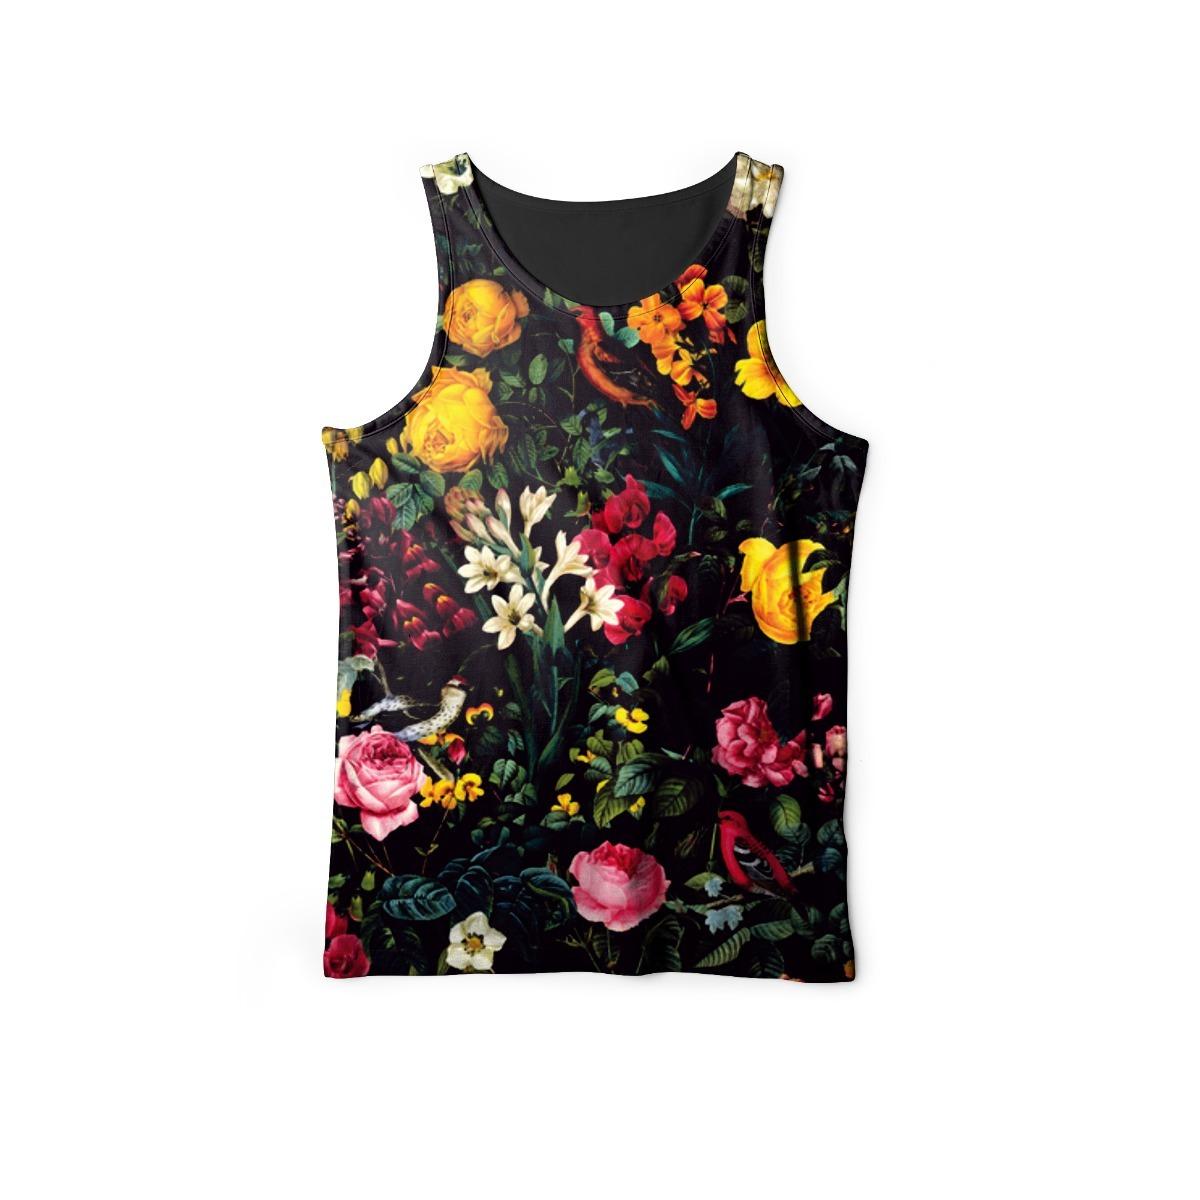 regata floral masculina camiseta estampada flores florida. Carregando zoom. 49518dbfe11